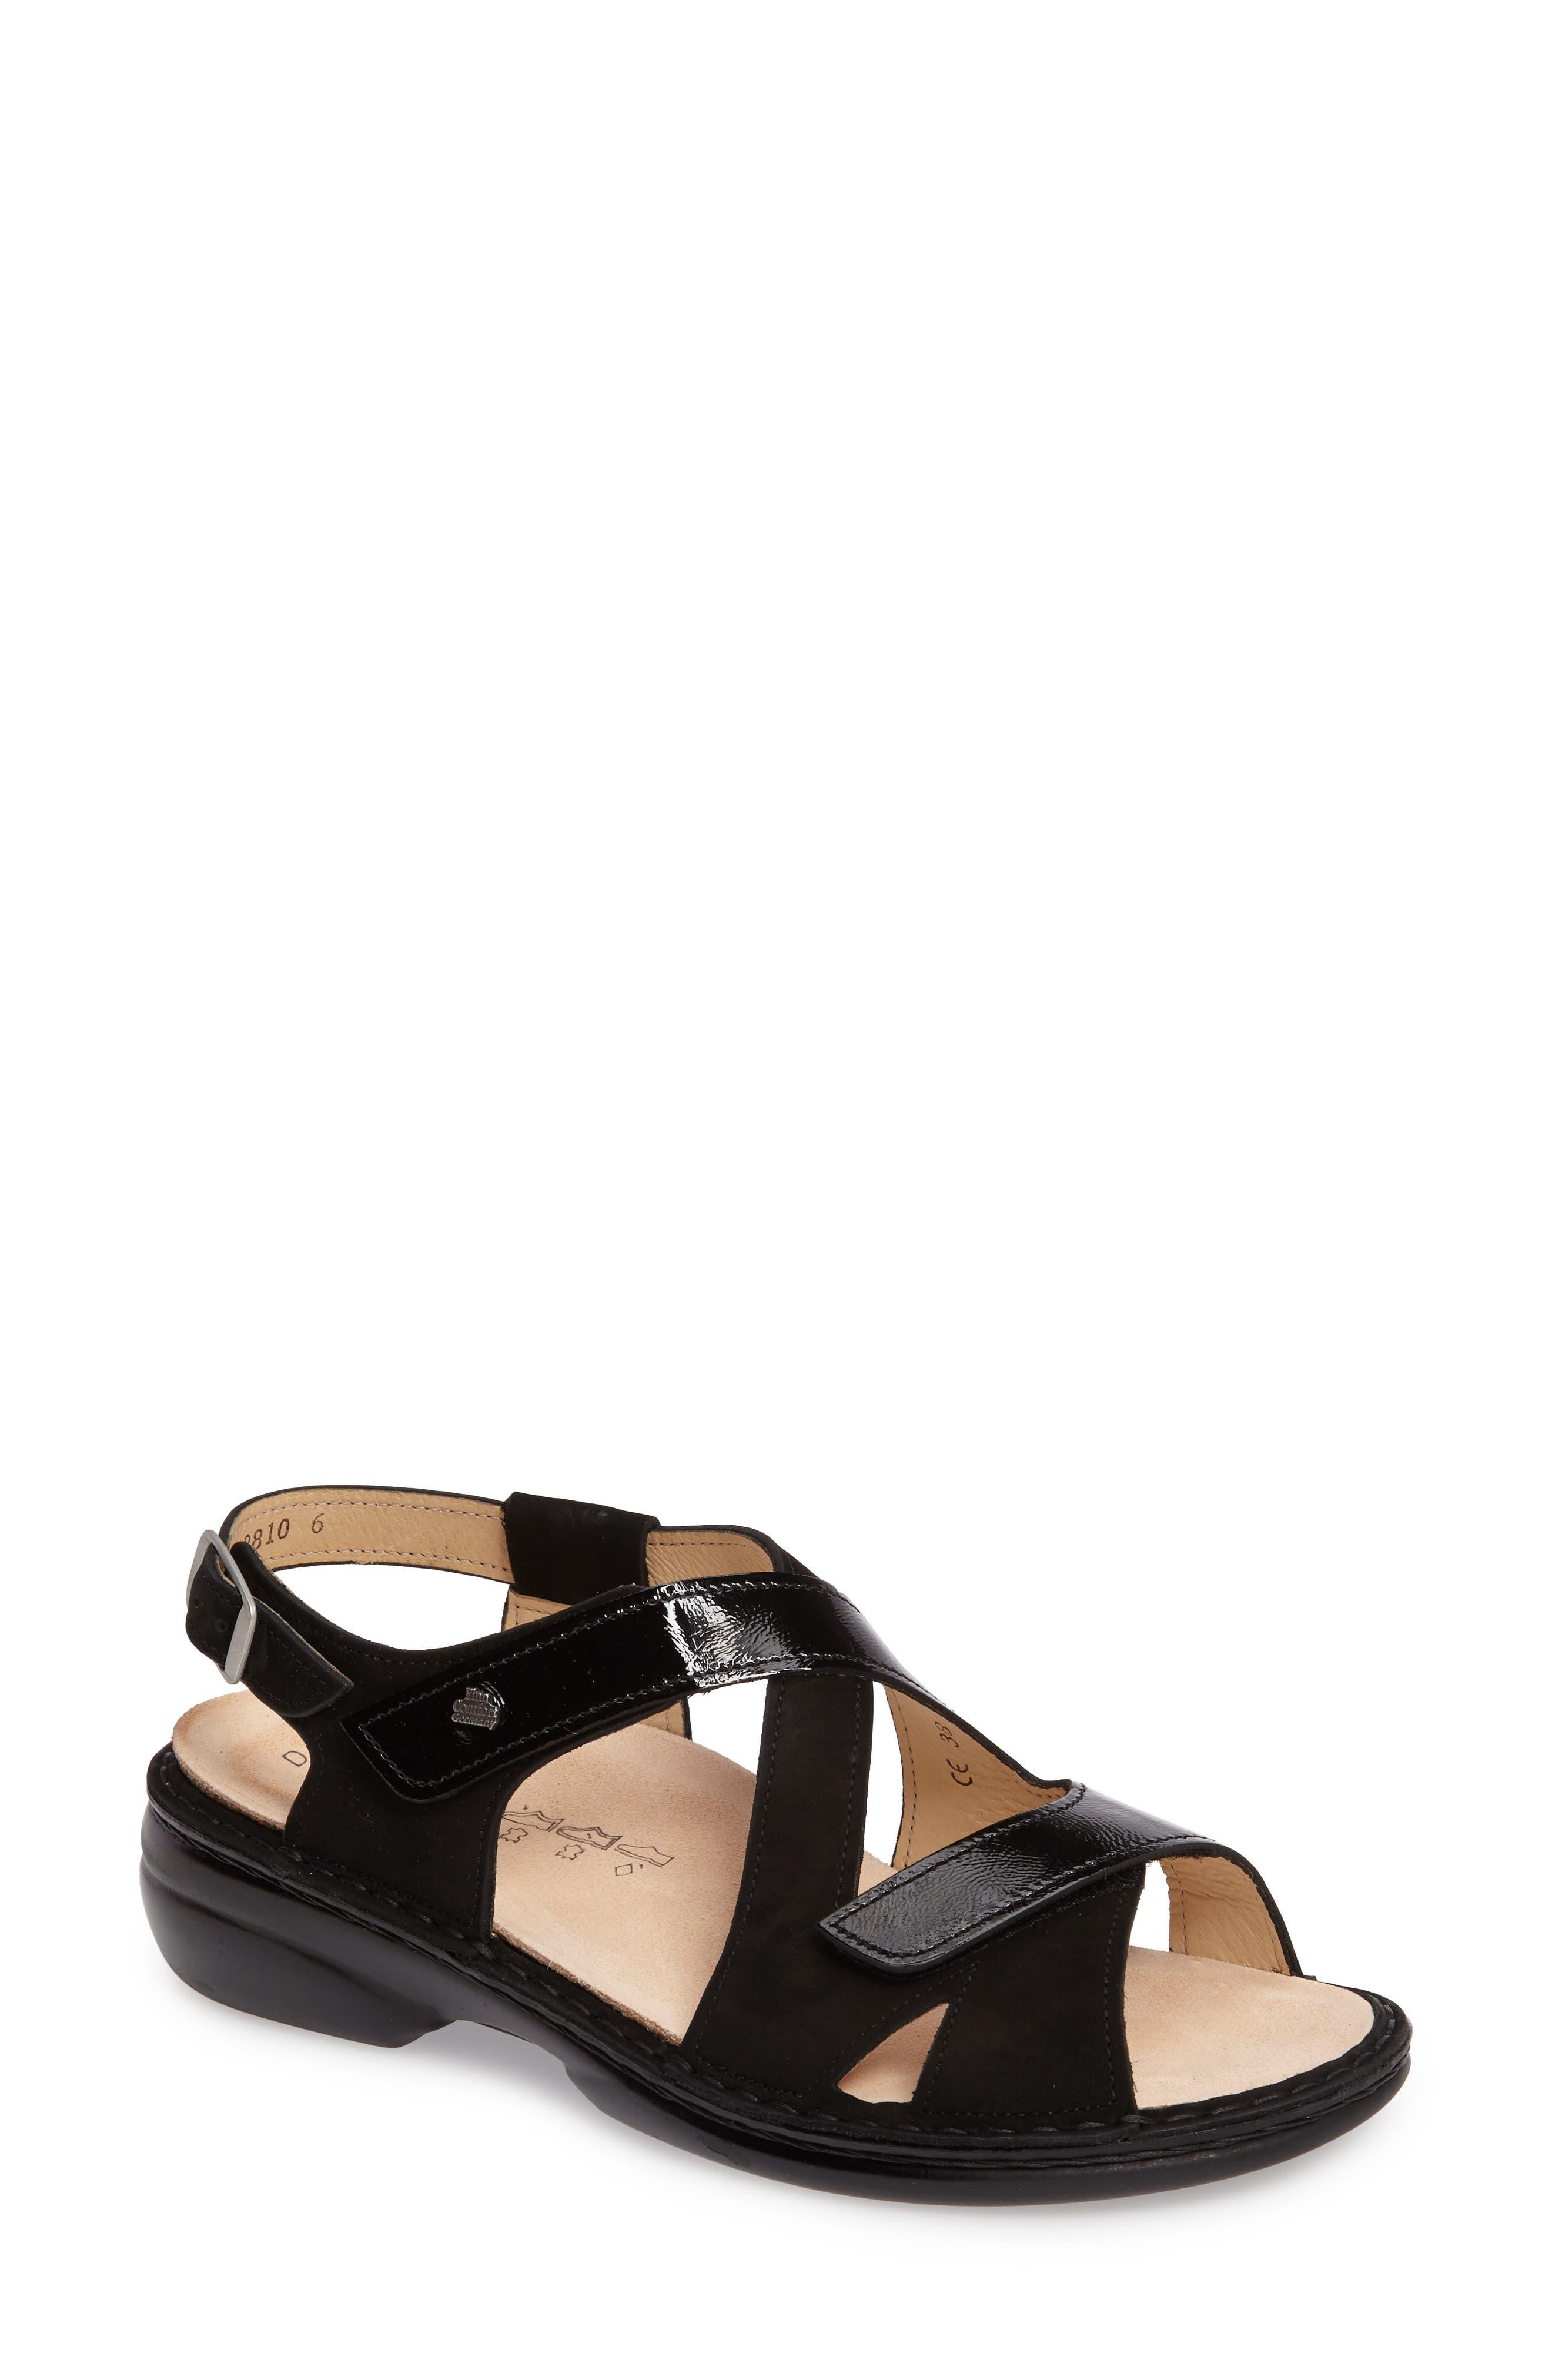 Leawood Sandal,                         Main,                         color, 001